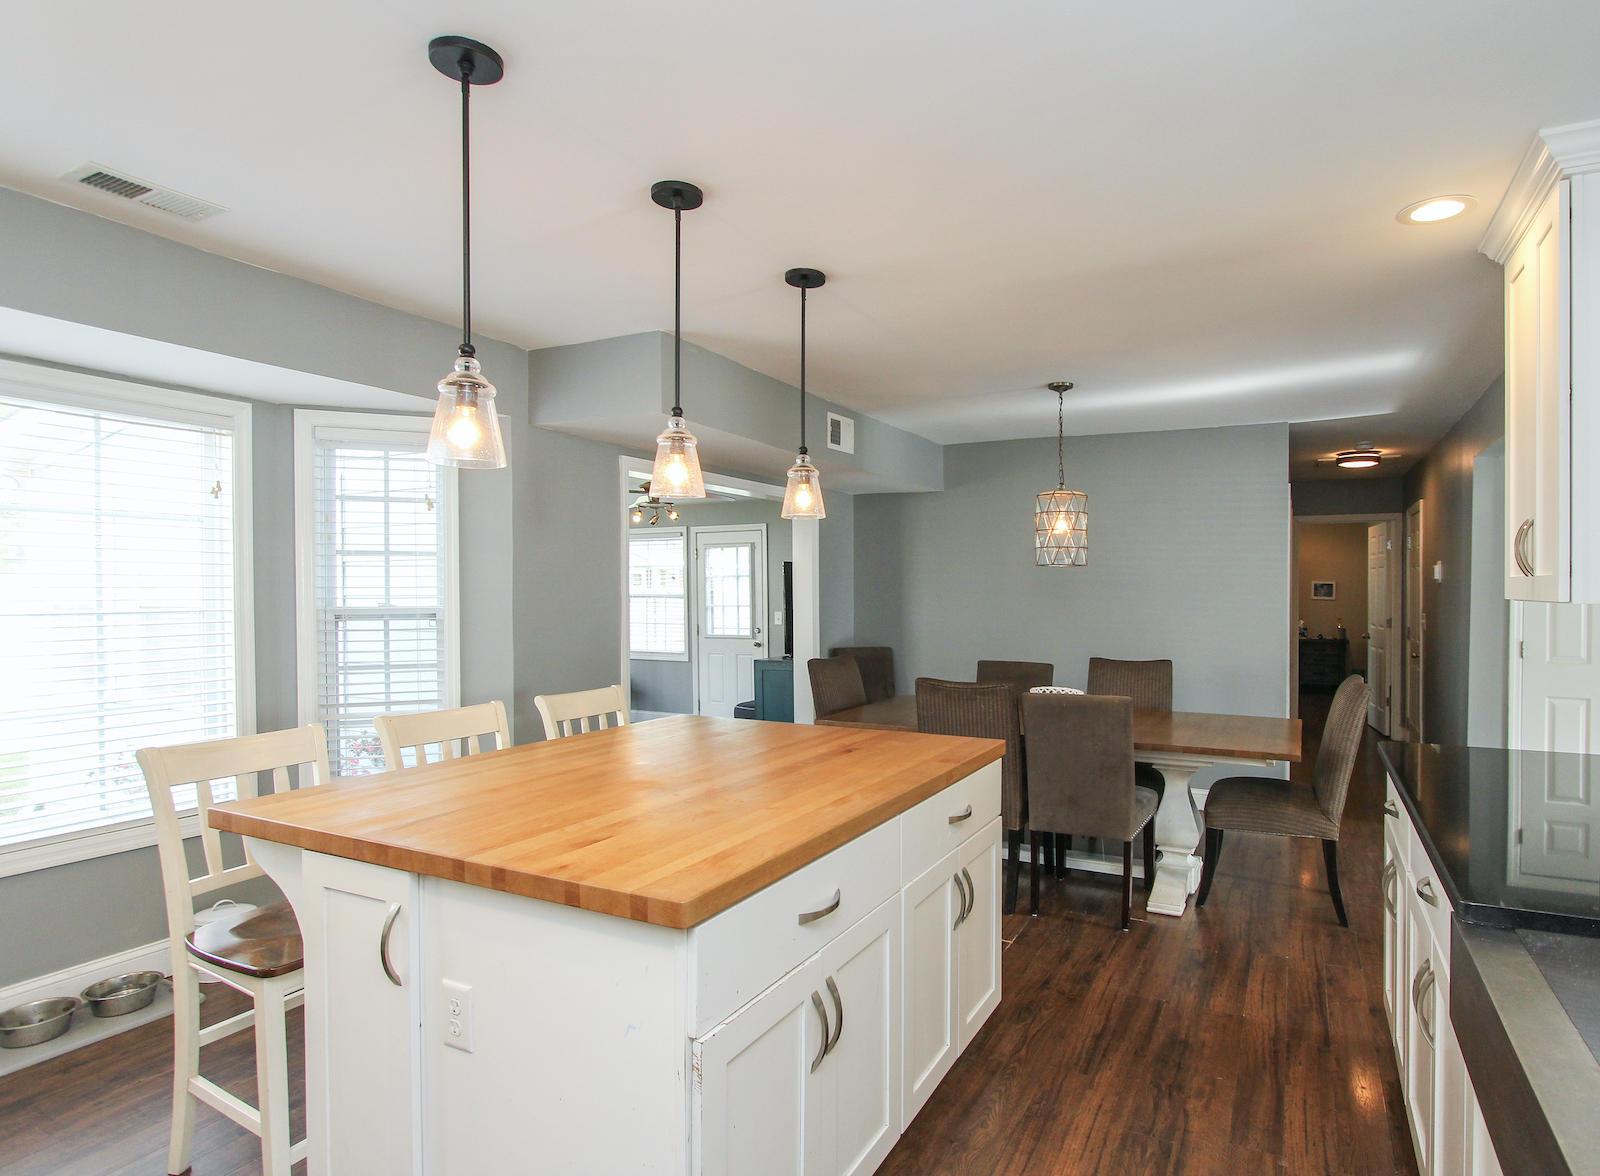 Landings Run Homes For Sale - 1548 Wickfield, Mount Pleasant, SC - 15